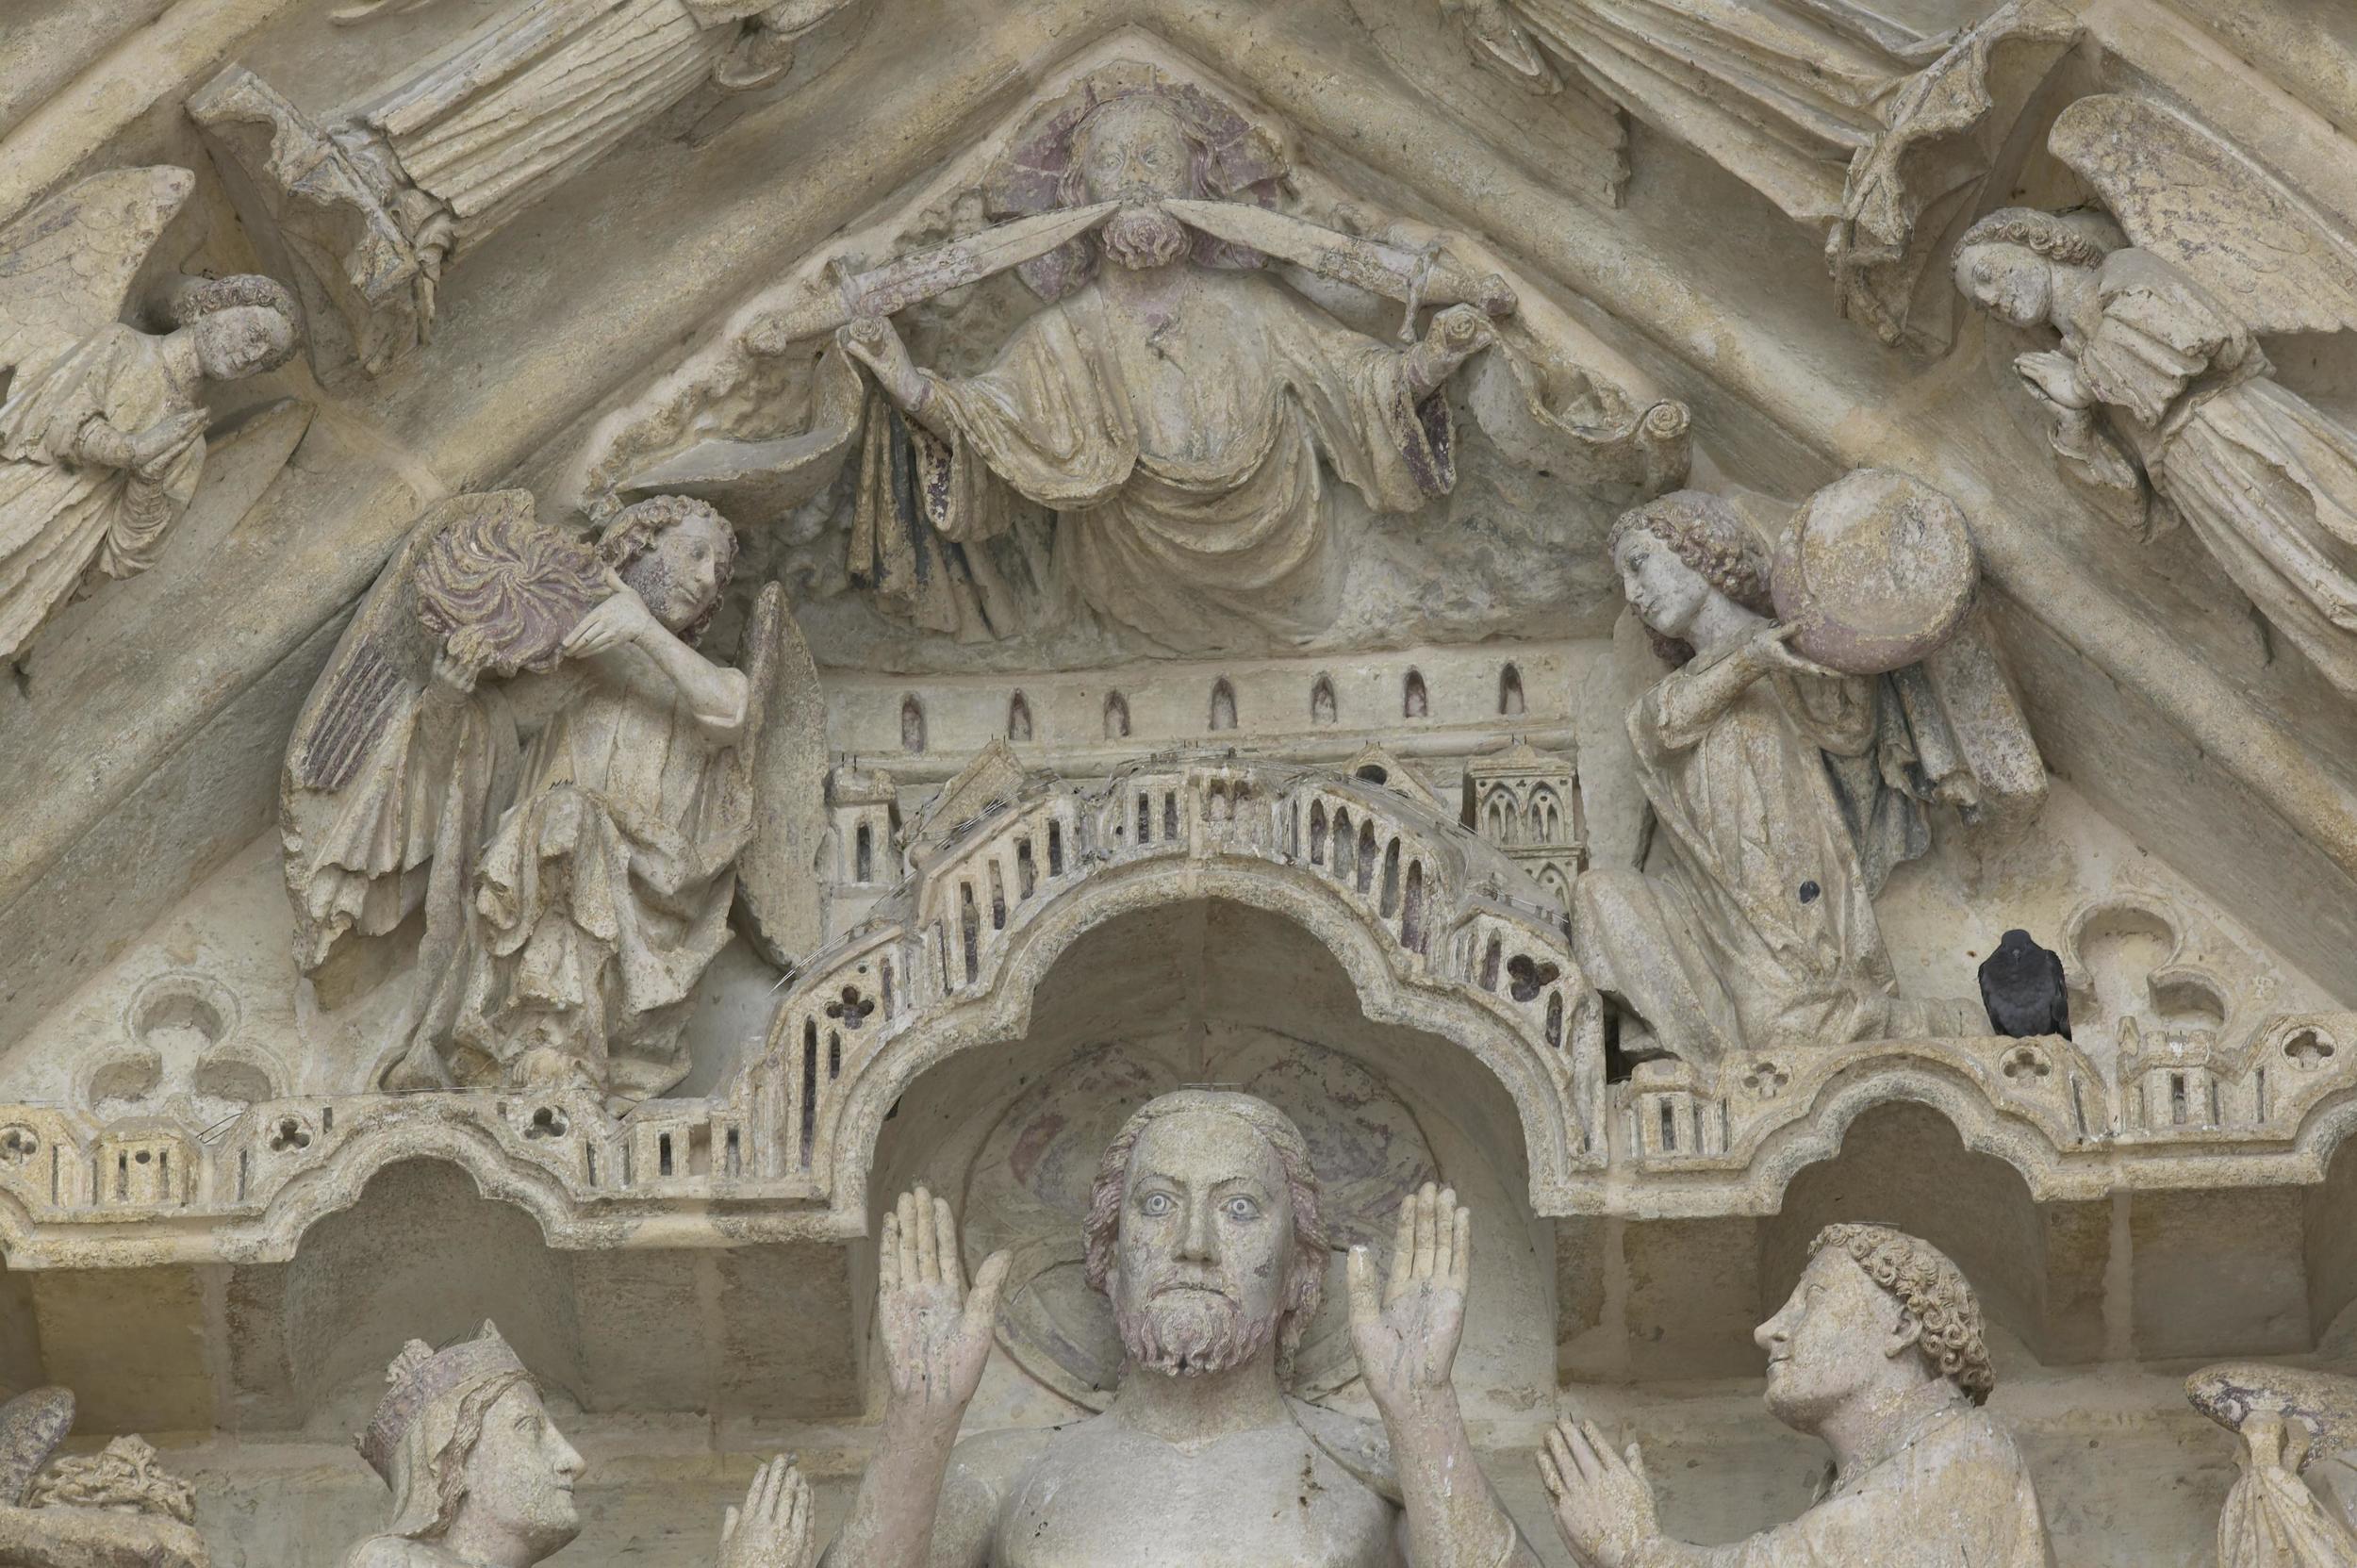 Christ in Judgement, Tympanum